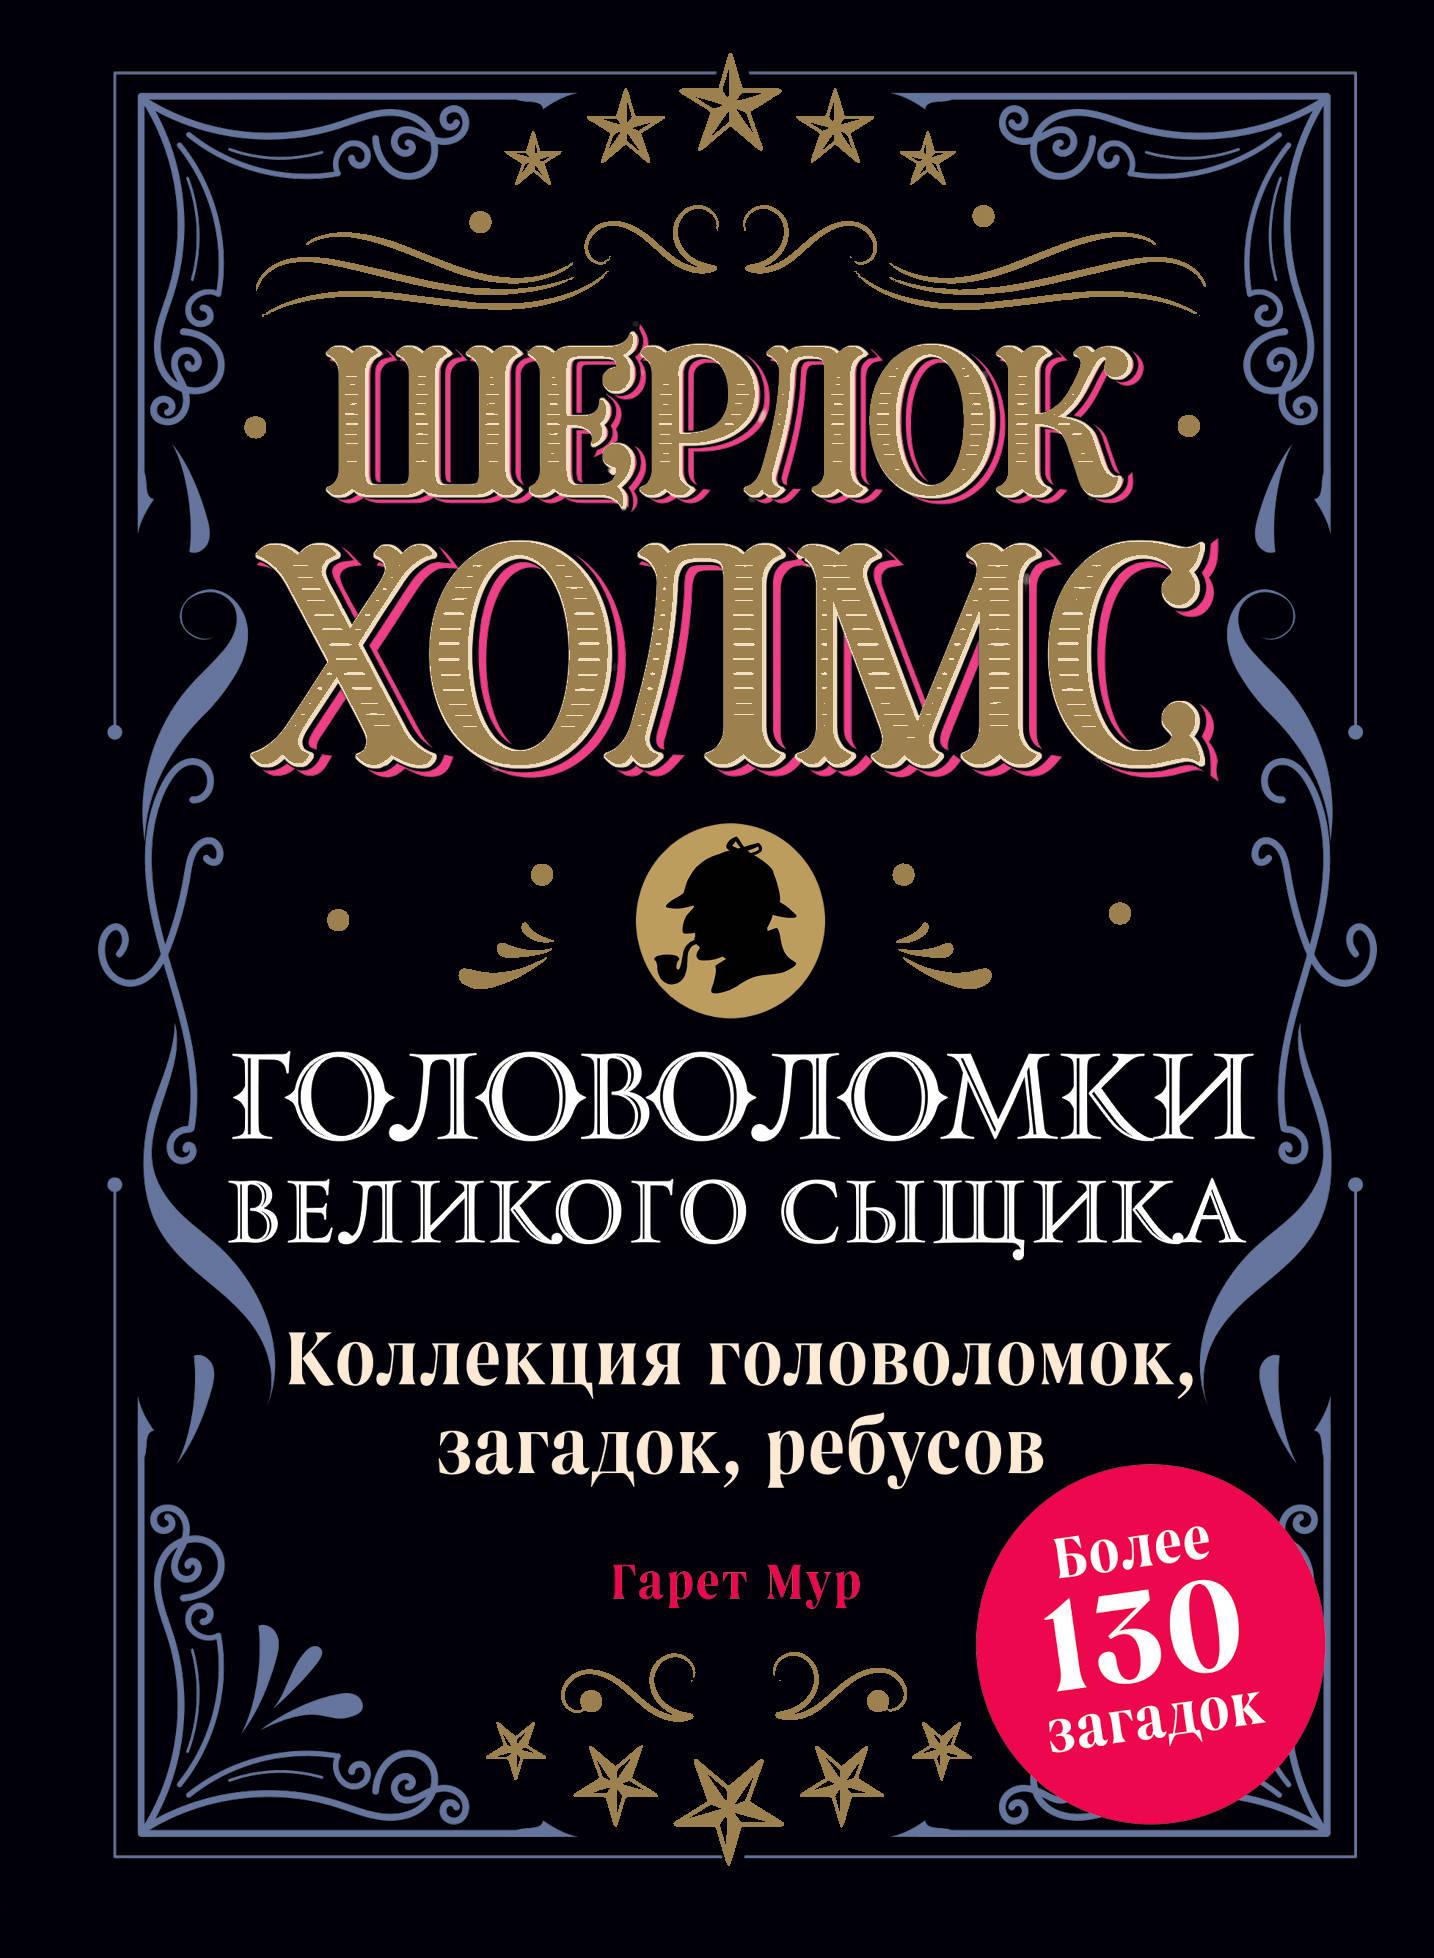 Zakazat.ru: Шерлок Холмс. Головоломки великого сыщика. Мур Гарет